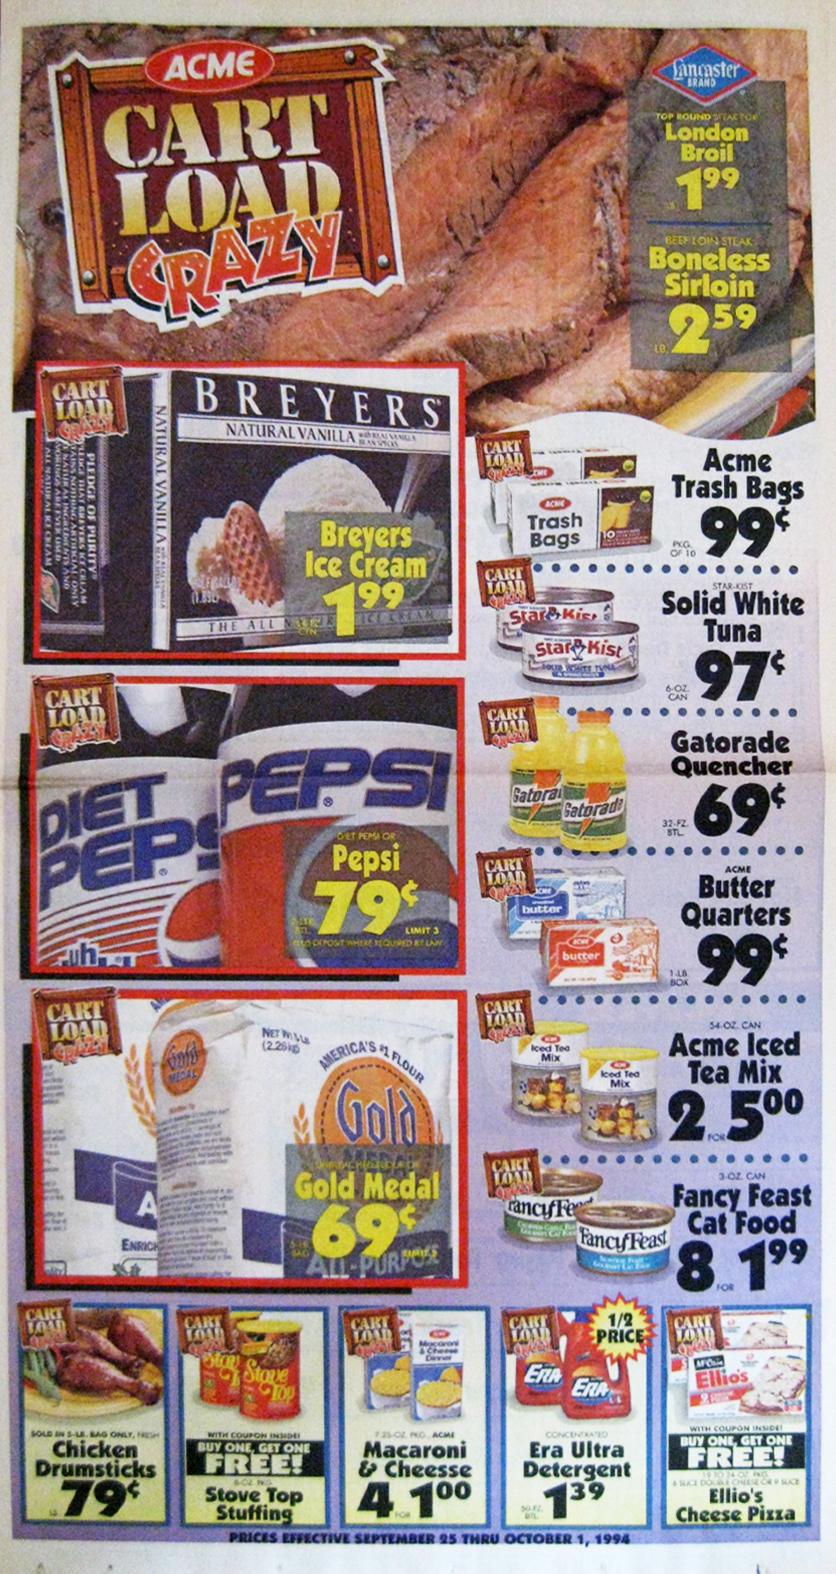 Acme Style Acme Cart Load Crazy Circular September 1994